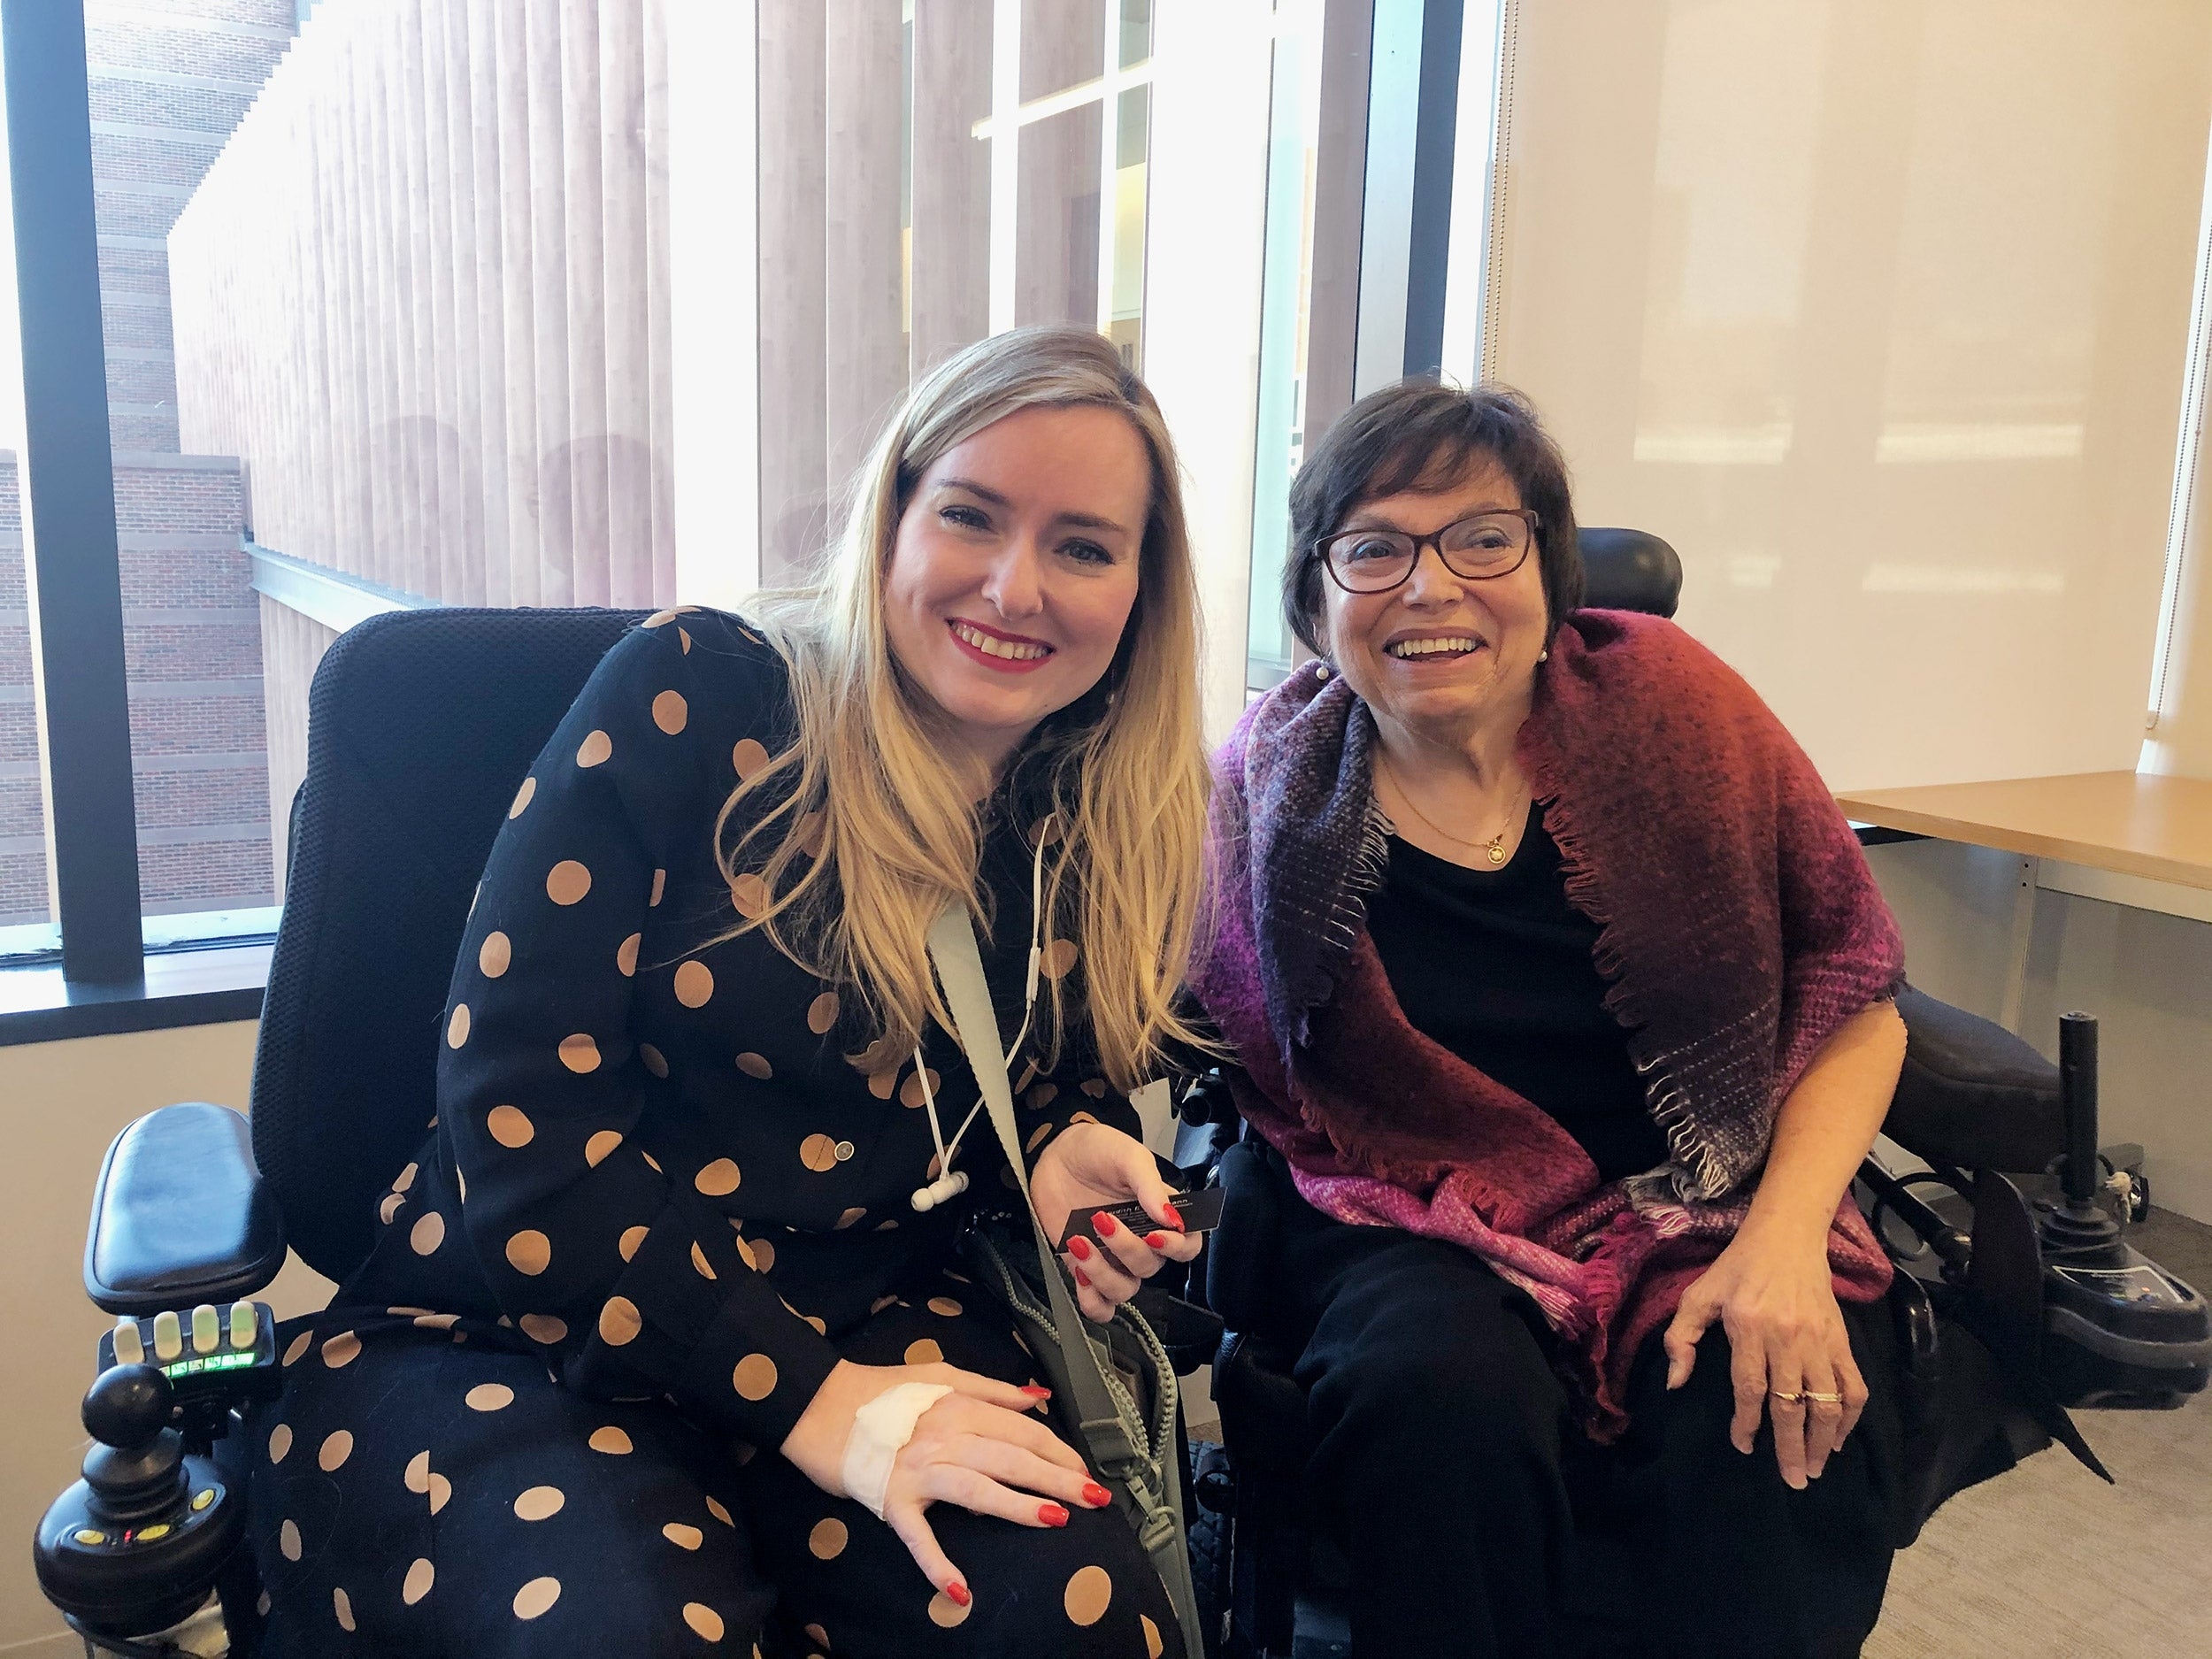 Ariella Barker with international disability rights activist Judith Heumann.